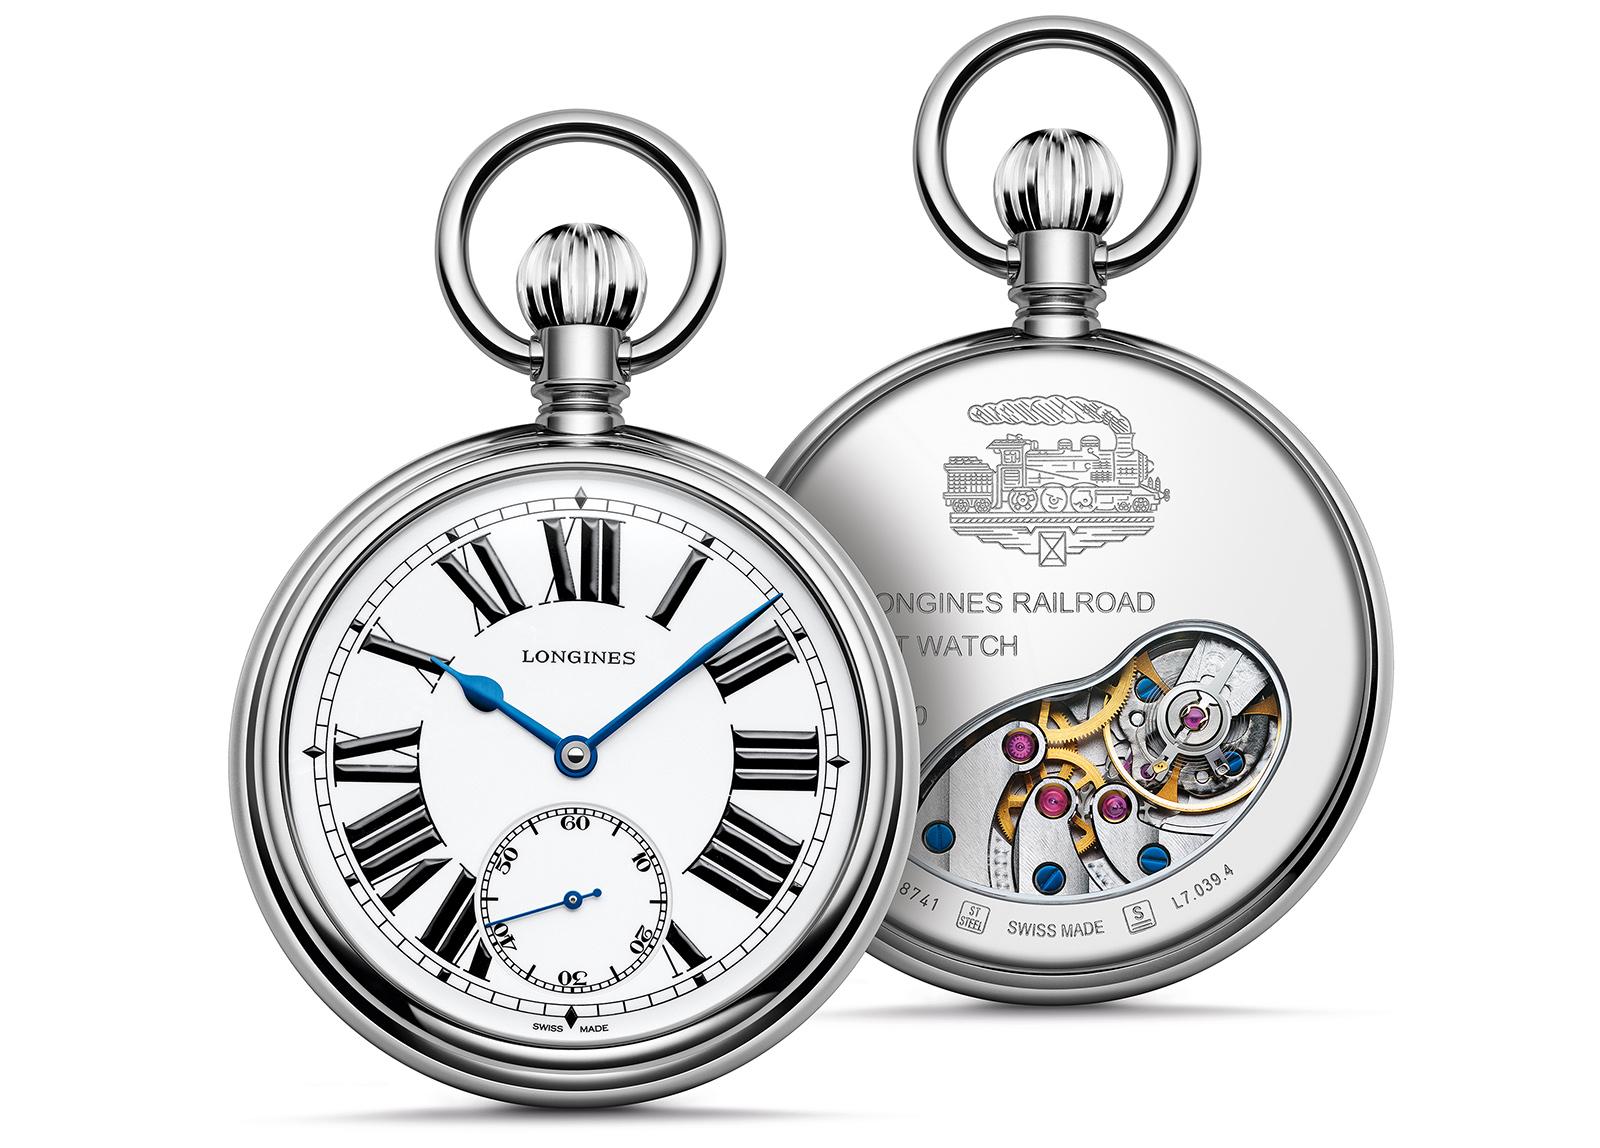 Longines RailRoad Pocket Watch